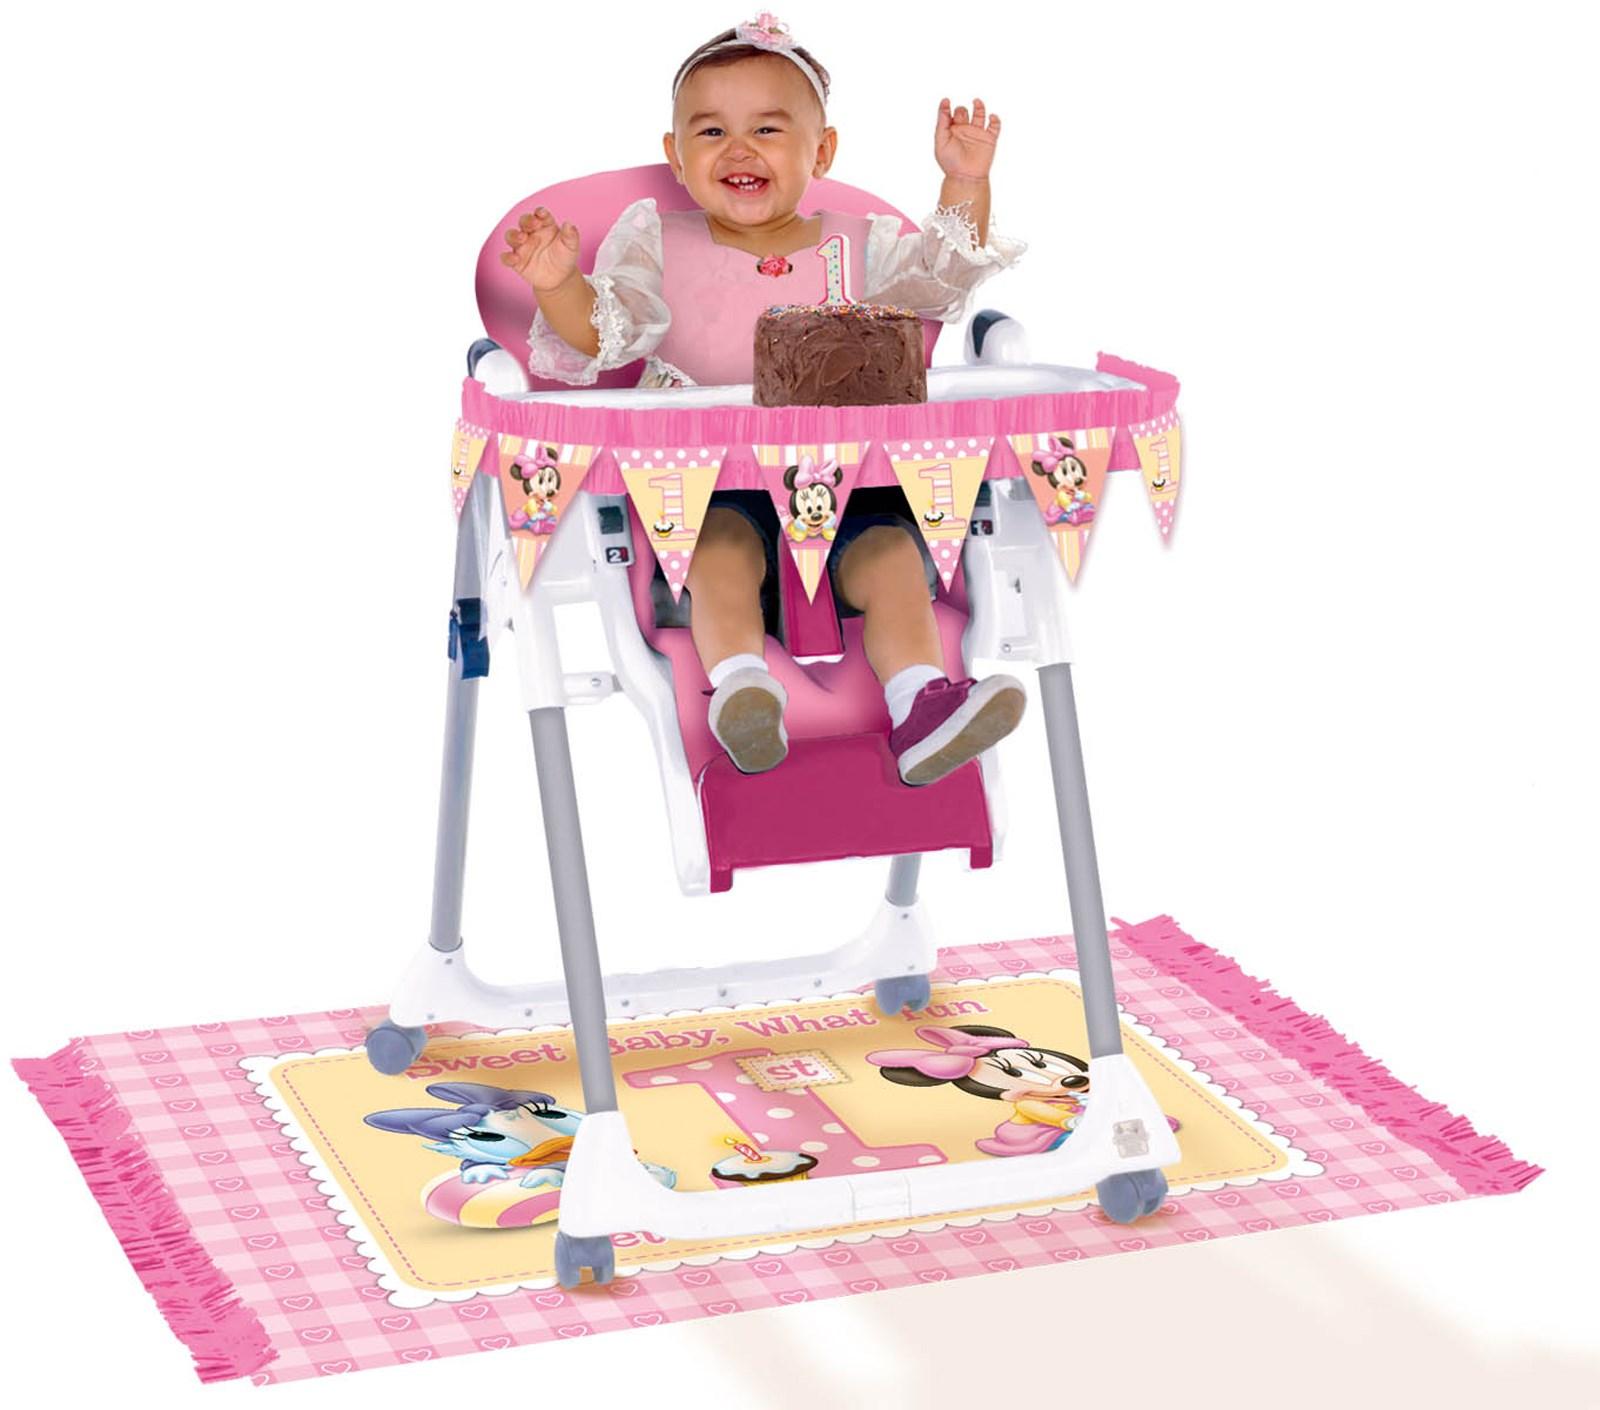 Disney Minnie s 1st High Chair Decorating Kit